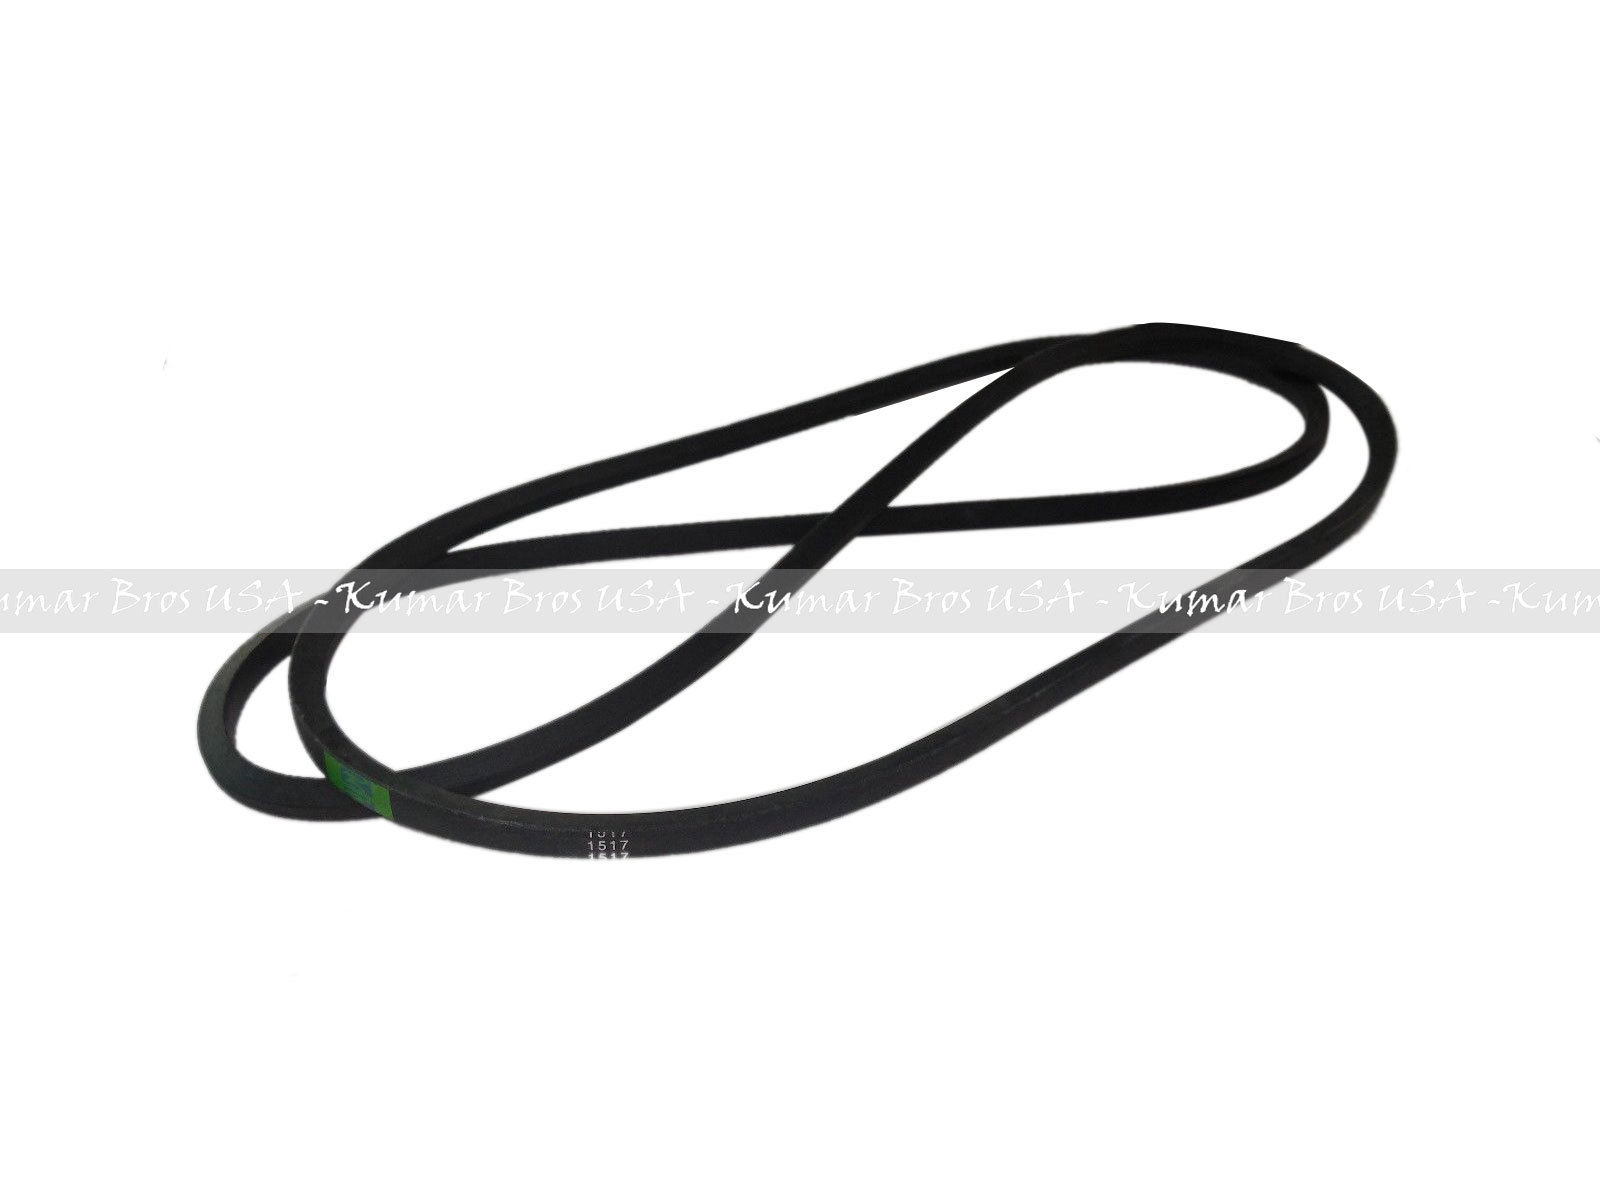 New MTD CUB CADET TORO 954-0283 754-0283 Toro 88-6240 Traction Drive Belt